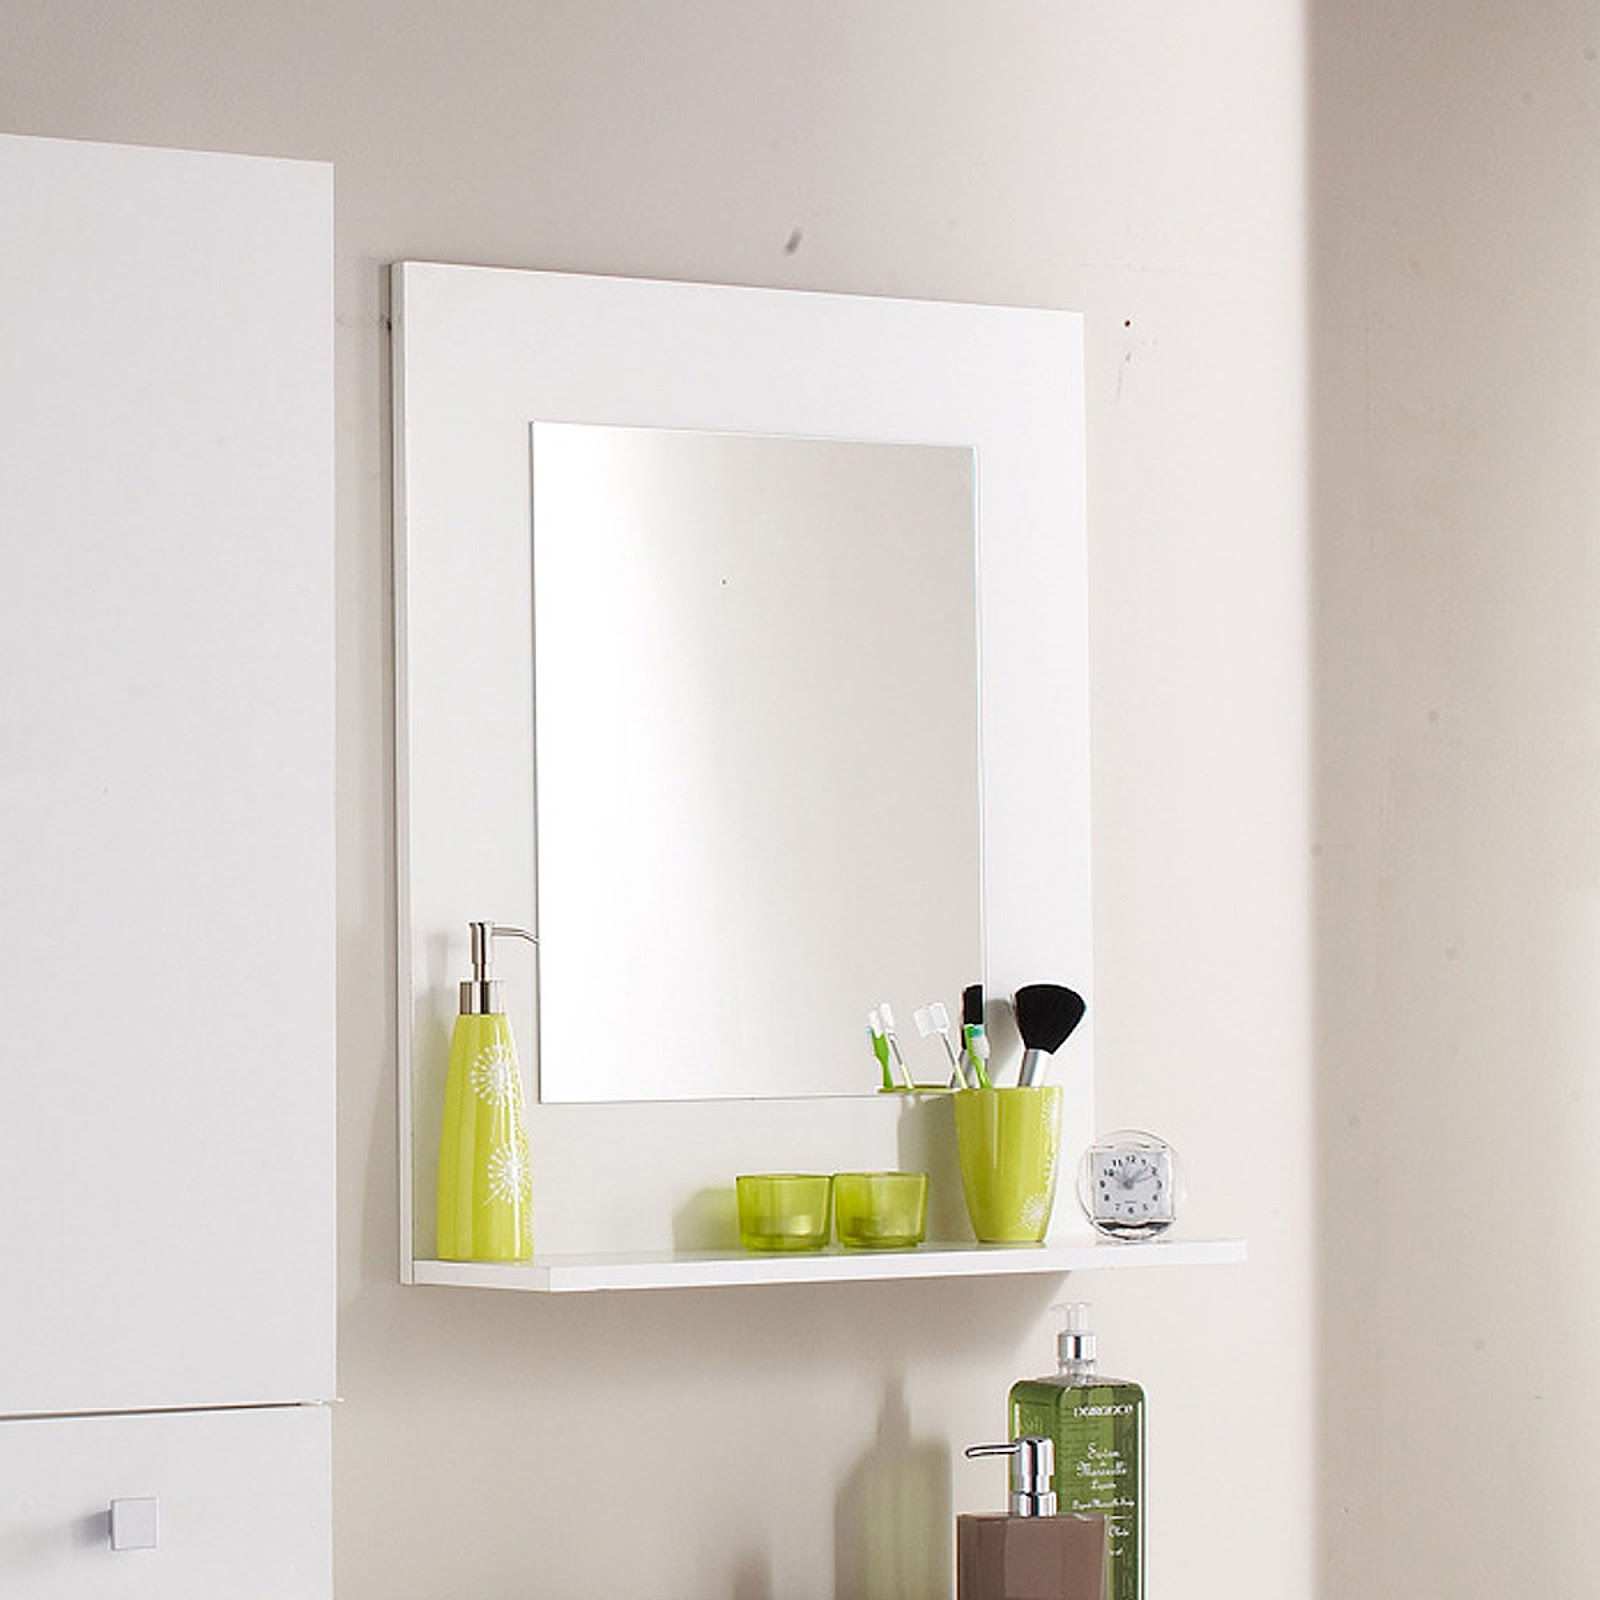 Salle De Bain Qweenie ~ miroir salle de bain 120×80 cm basic of miroir simple deplim com